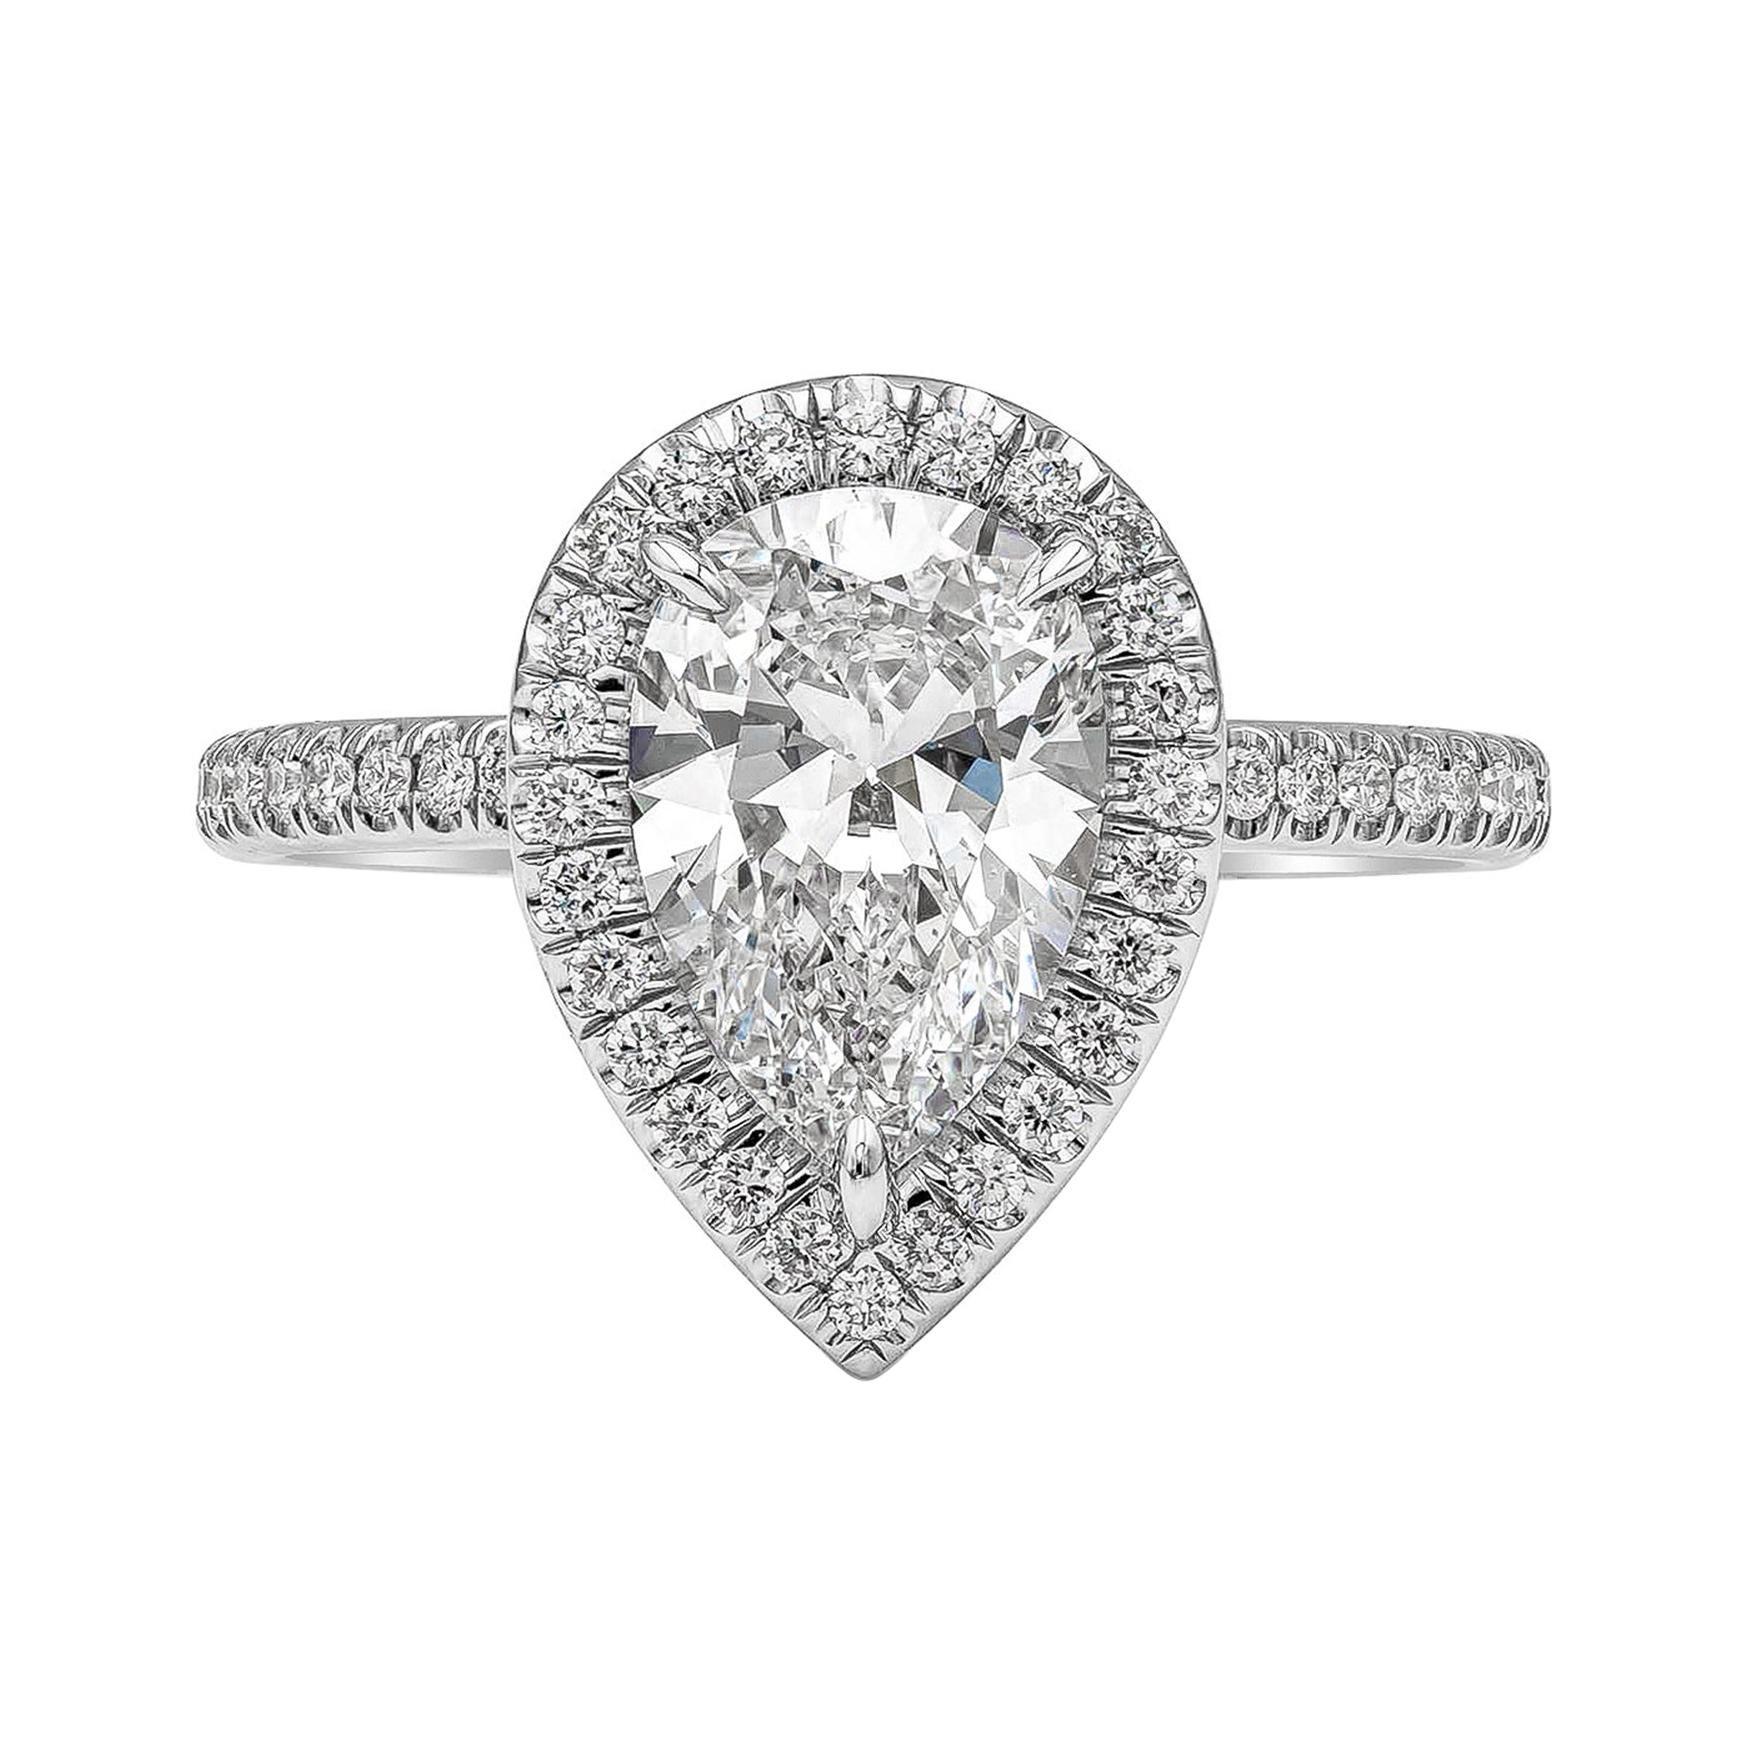 GIA Certified 1.89 Carat Pear Shape Diamond Halo Engagement Ring